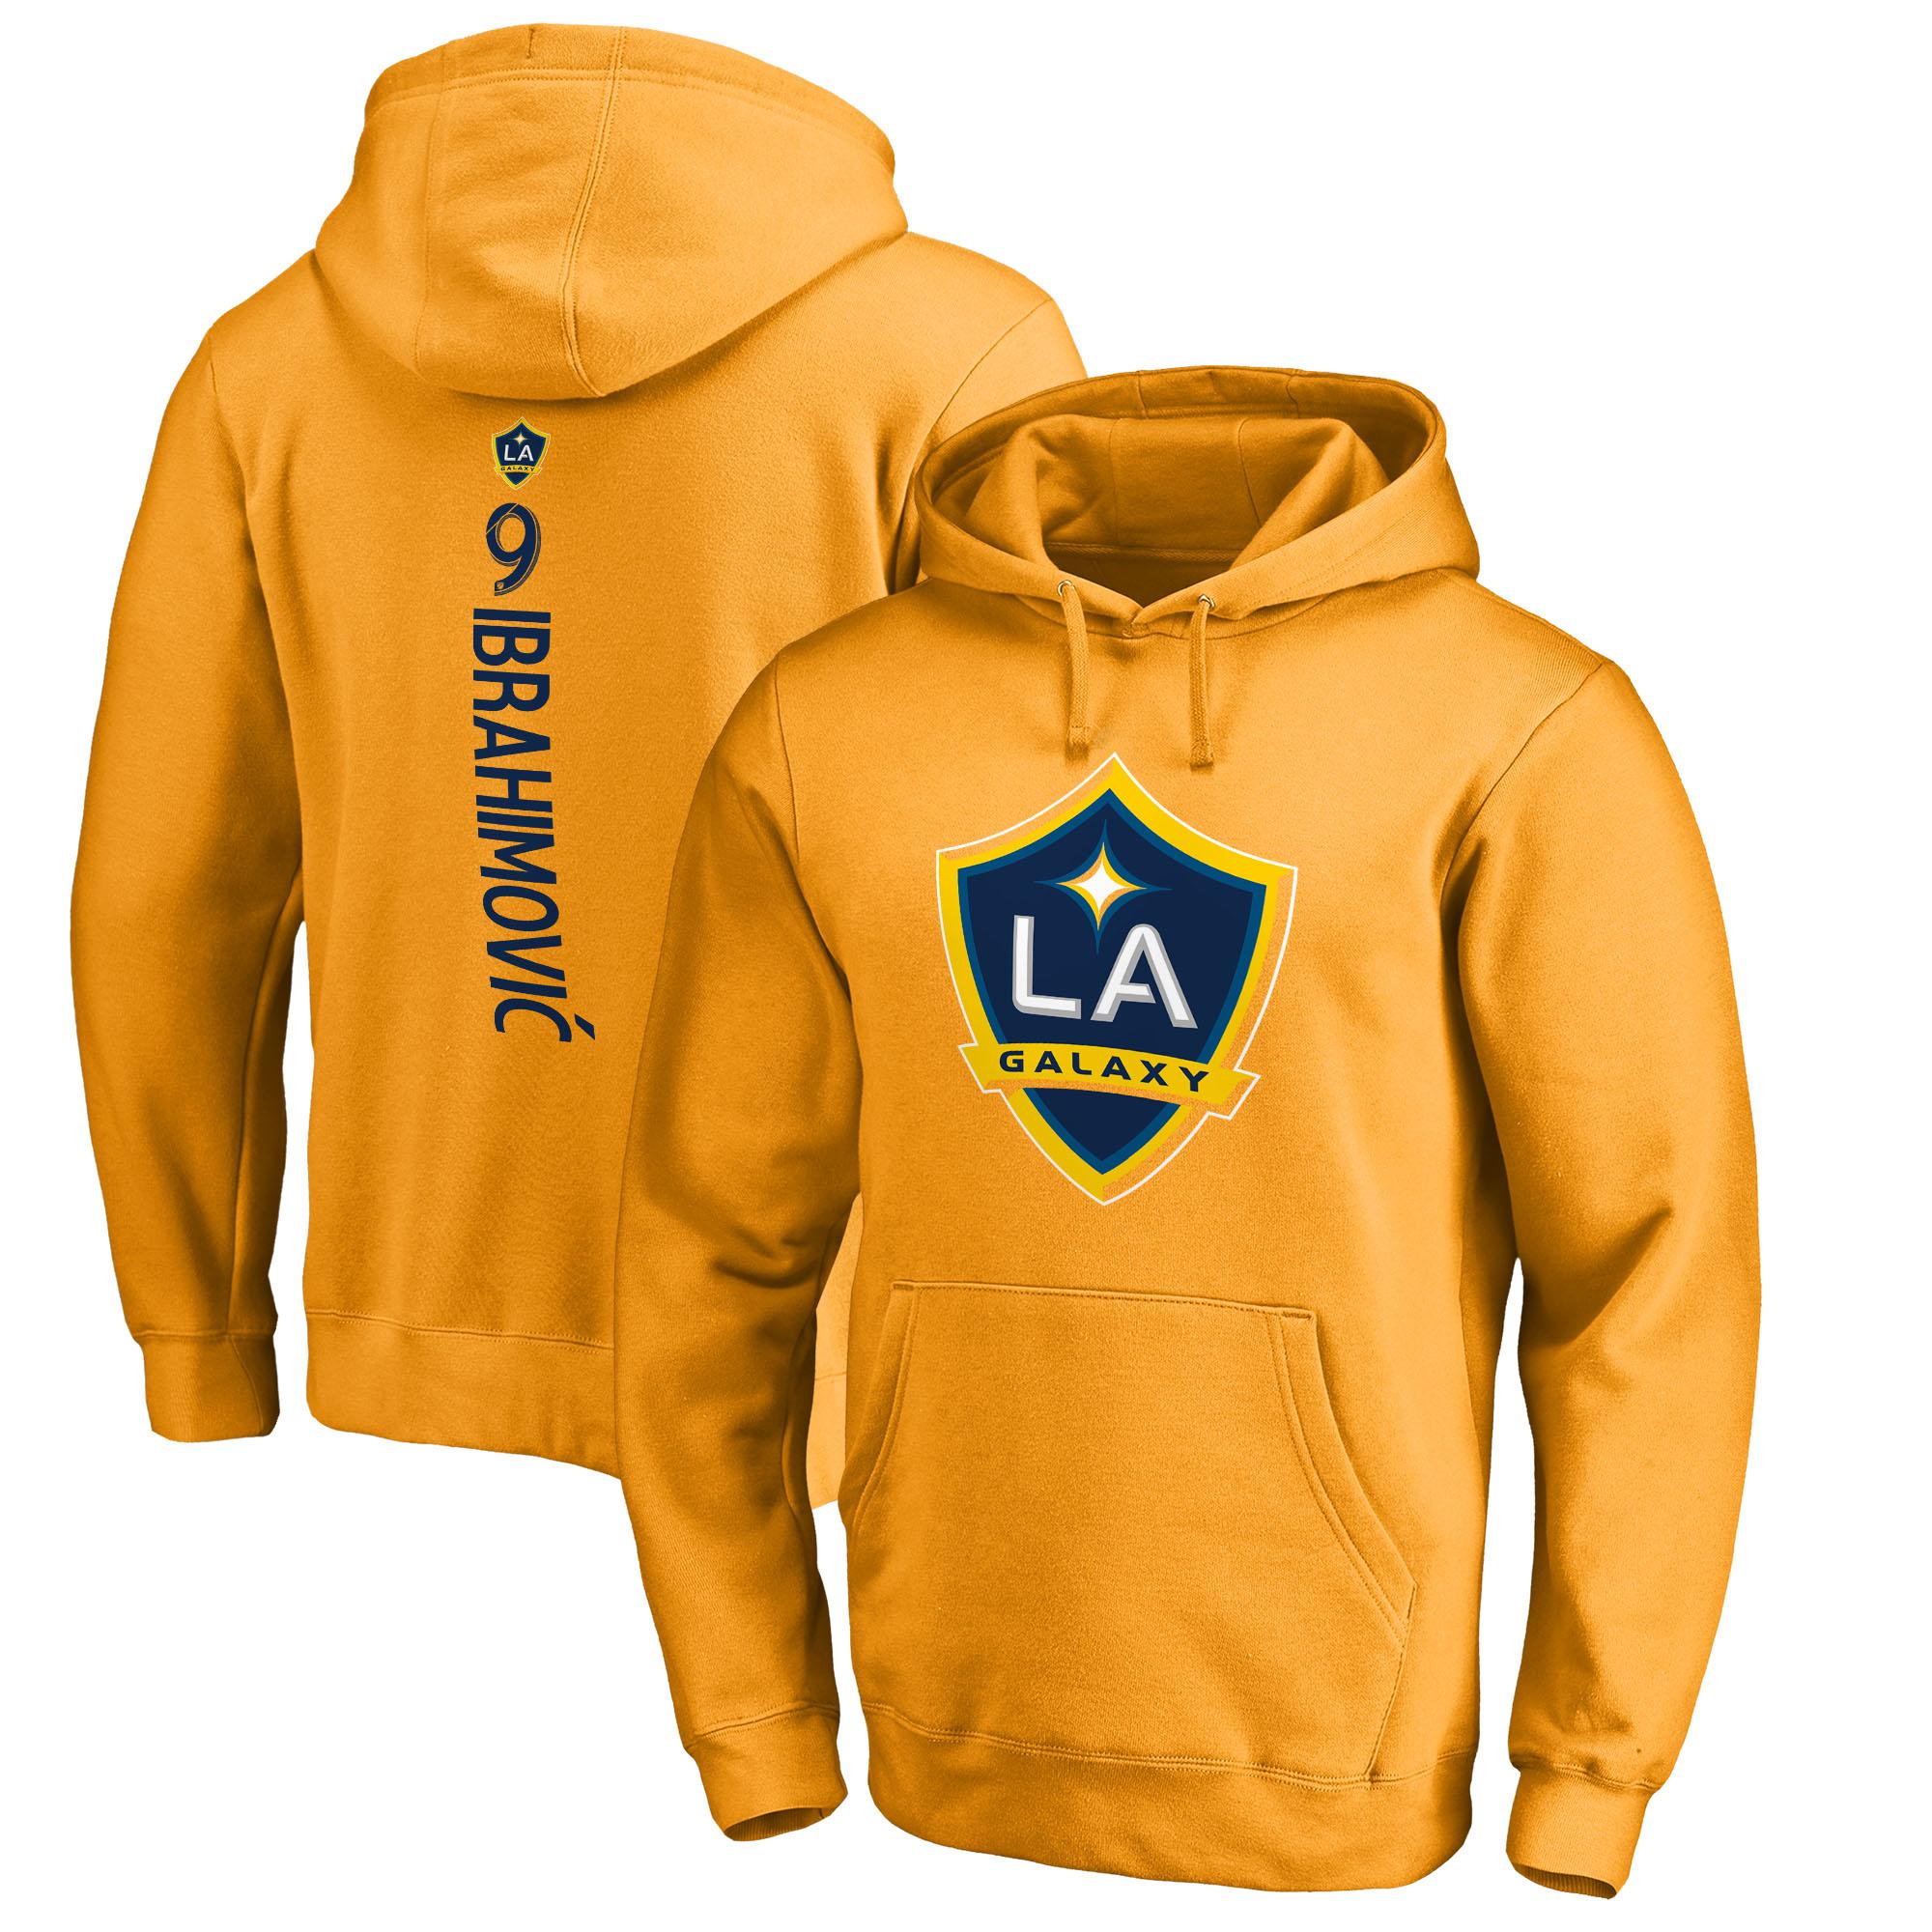 Zlatan Ibrahimovic LA Galaxy Fanatics Branded Backer Pullover Hoodie - Gold